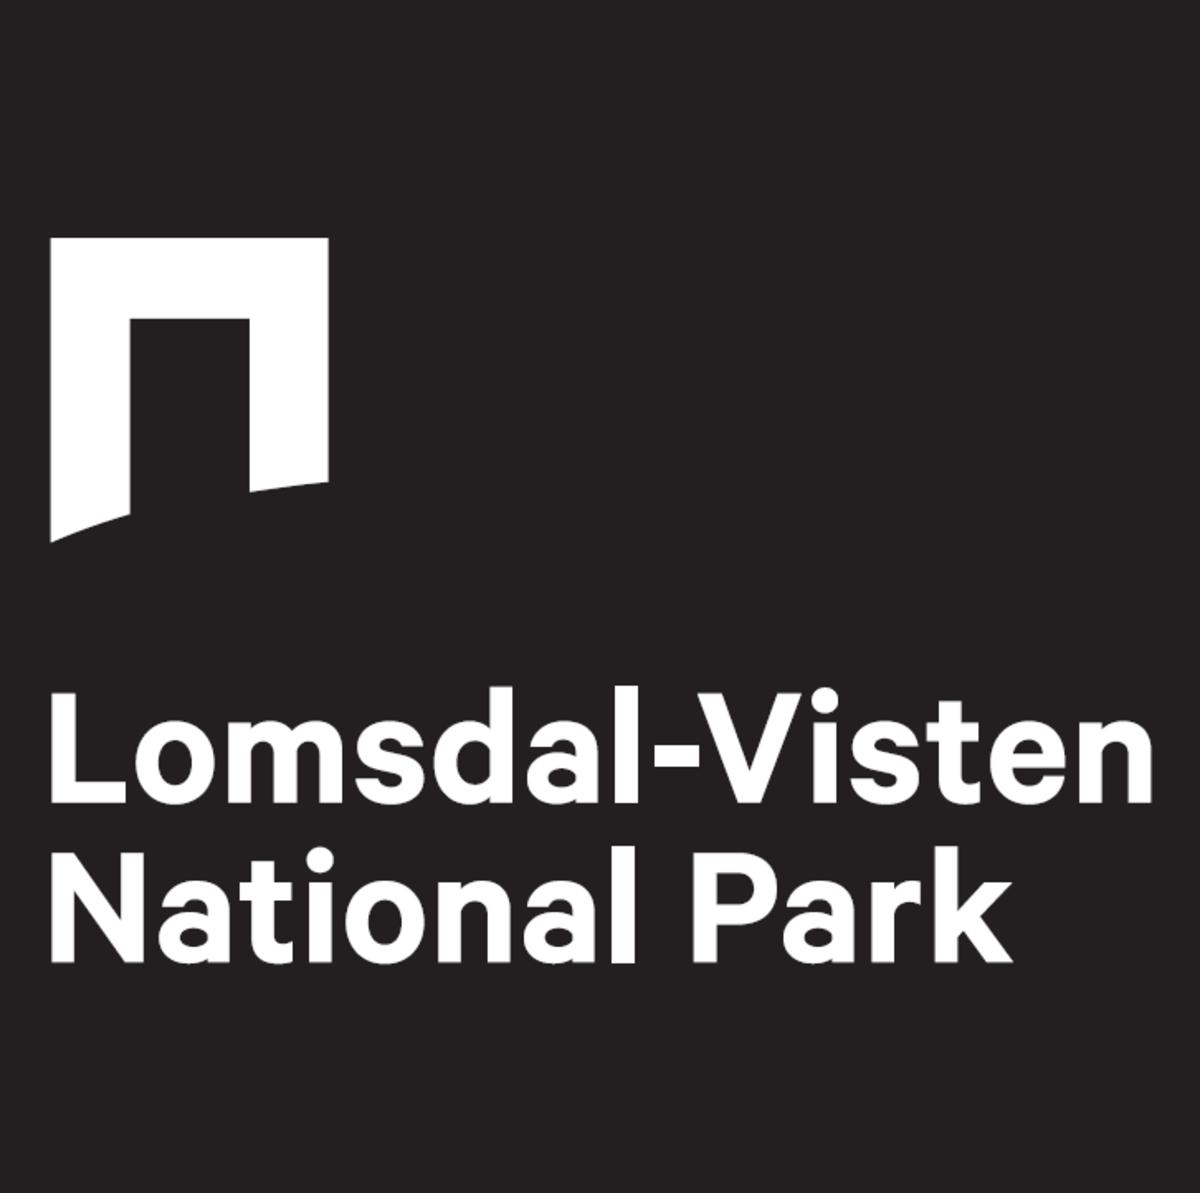 Profilbilde for Lomsdal-Visten nasjonalpark/Njaarken vaarjelimmiedajve